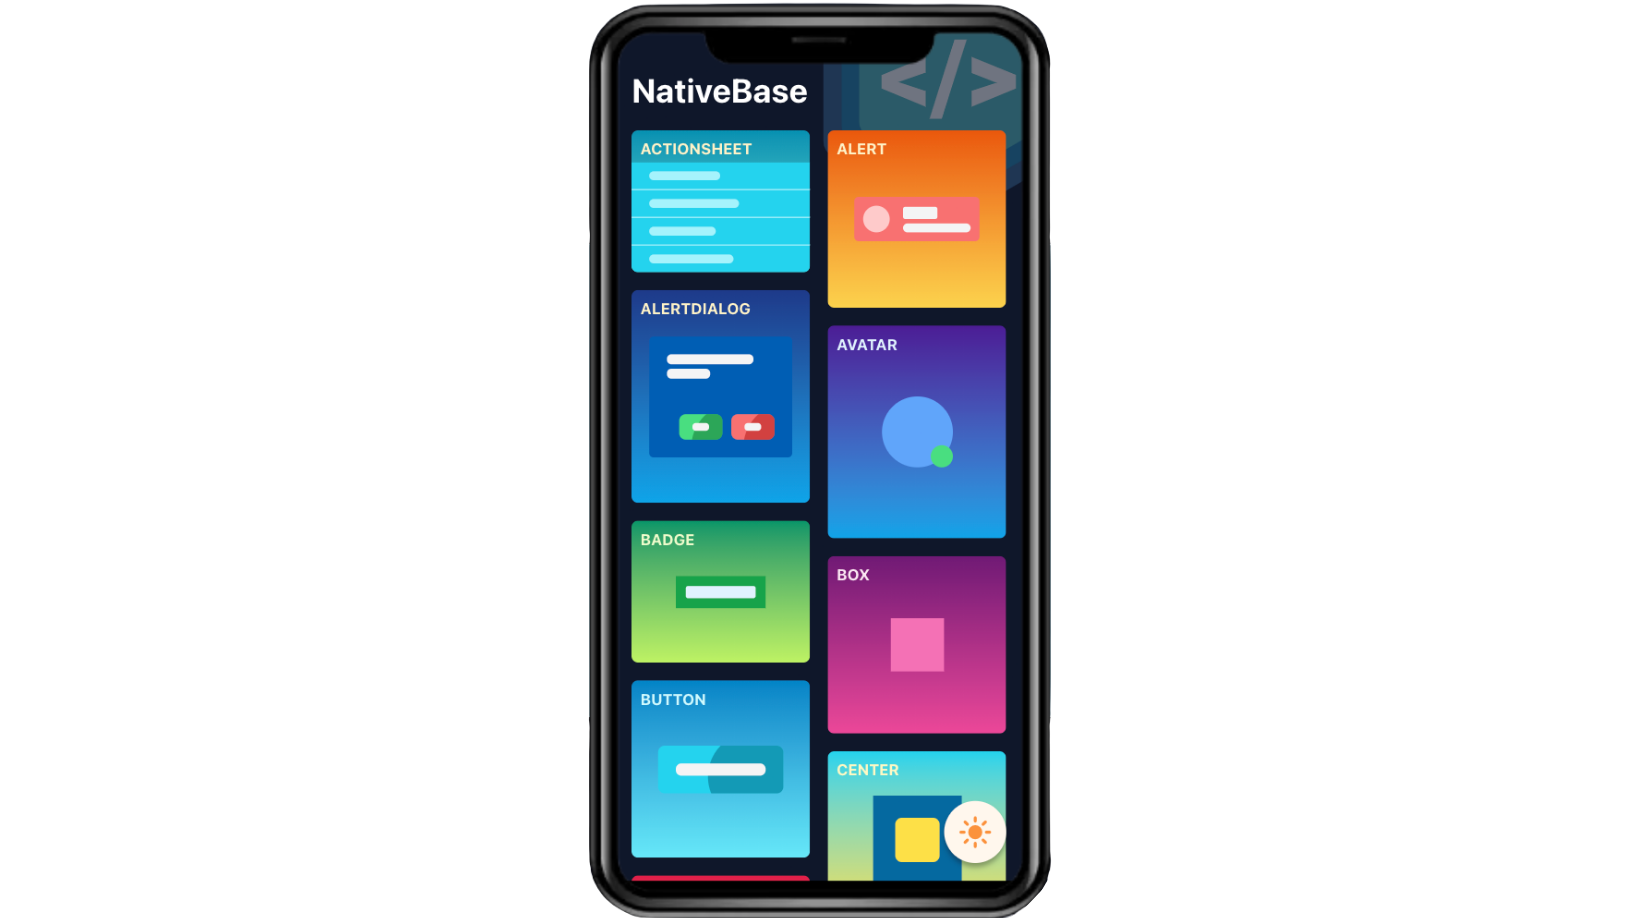 A mockup screen from NativeBase.